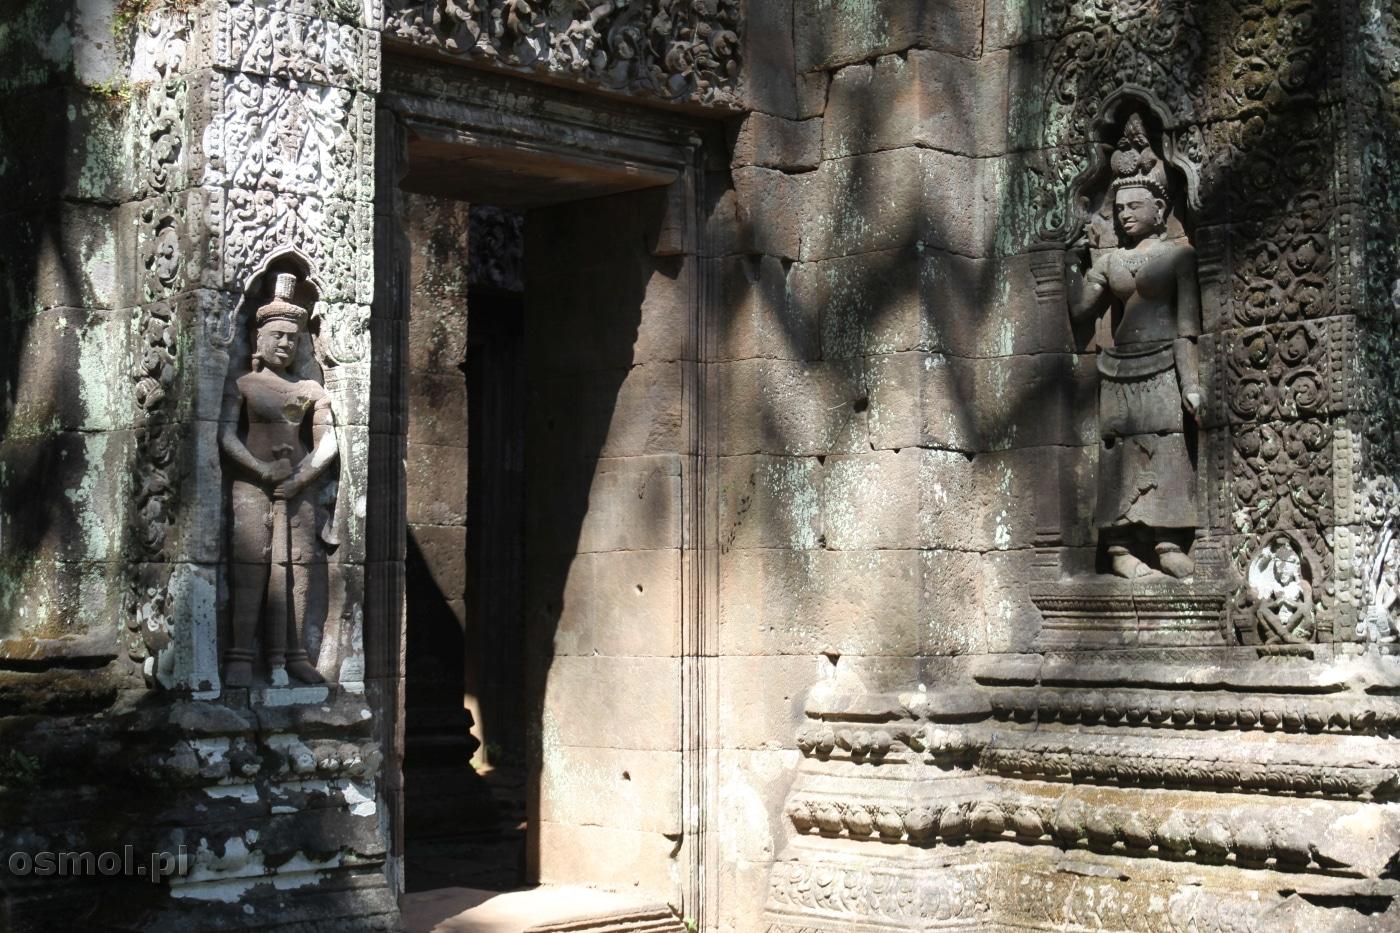 Rzeźby w Wat Phou blisko Champasak